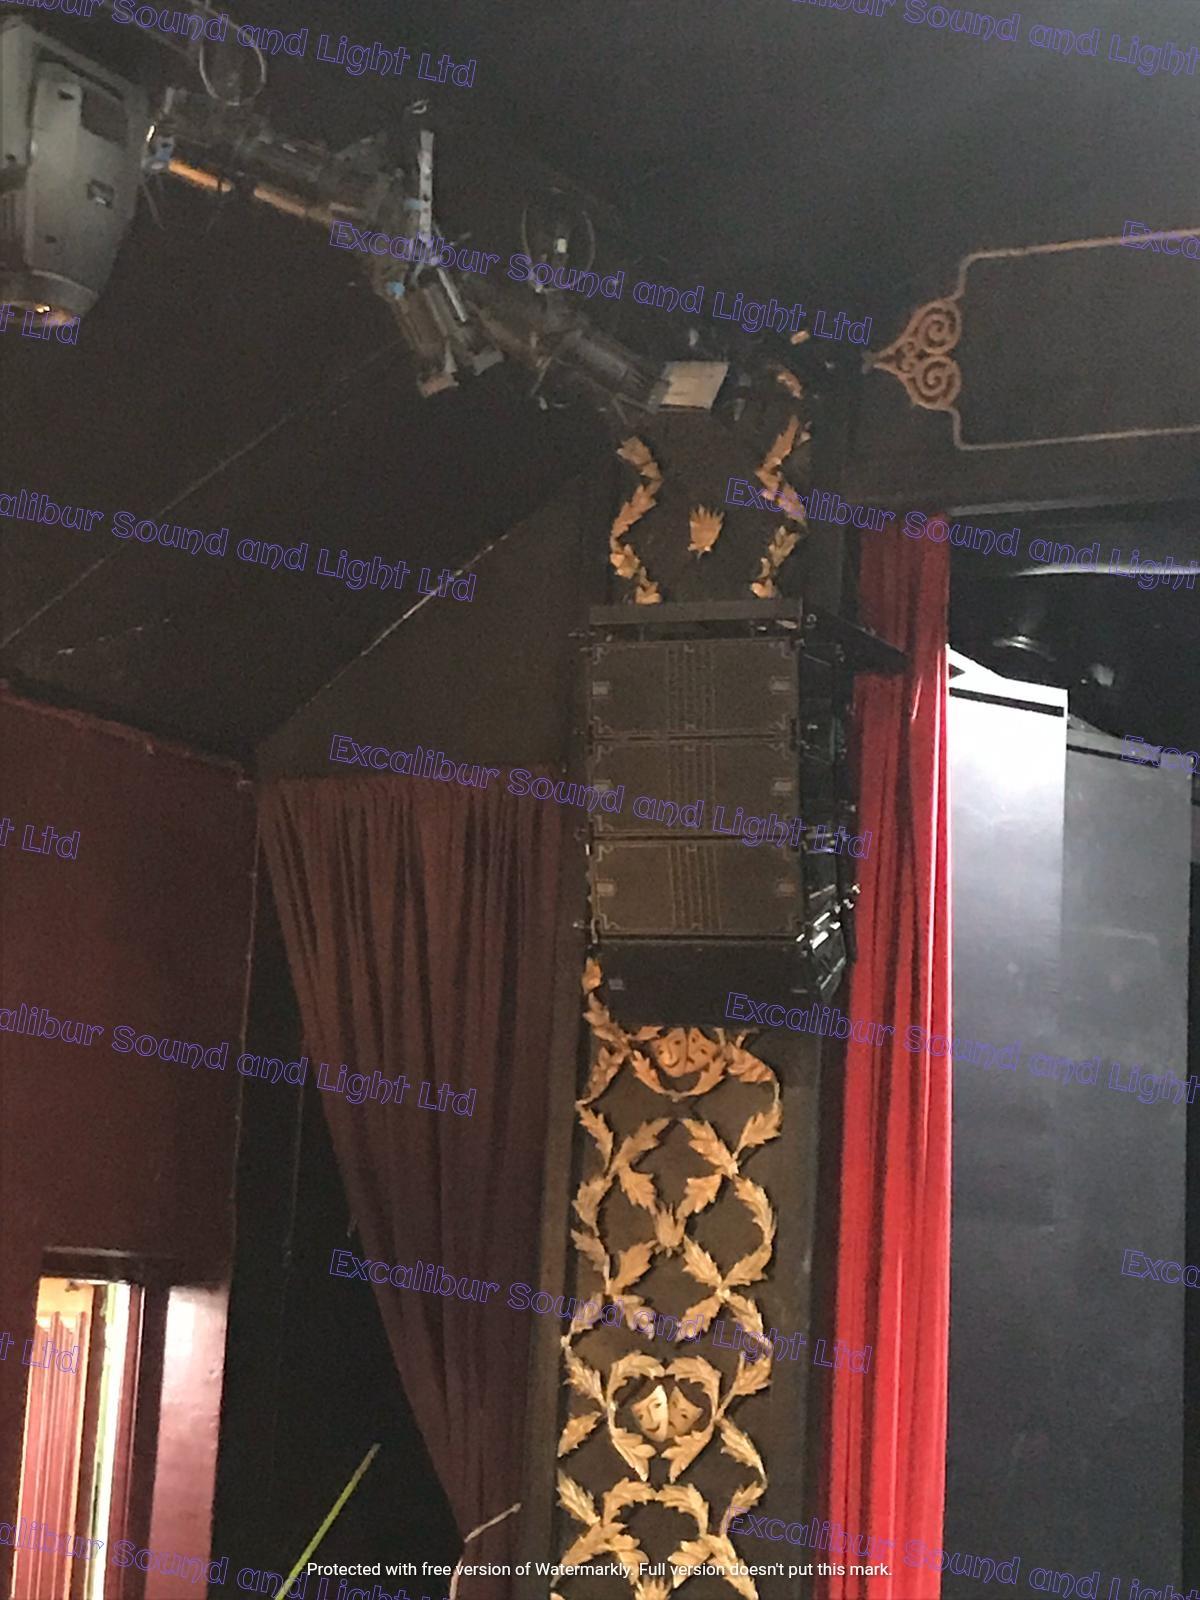 Halstead Empire Theatre